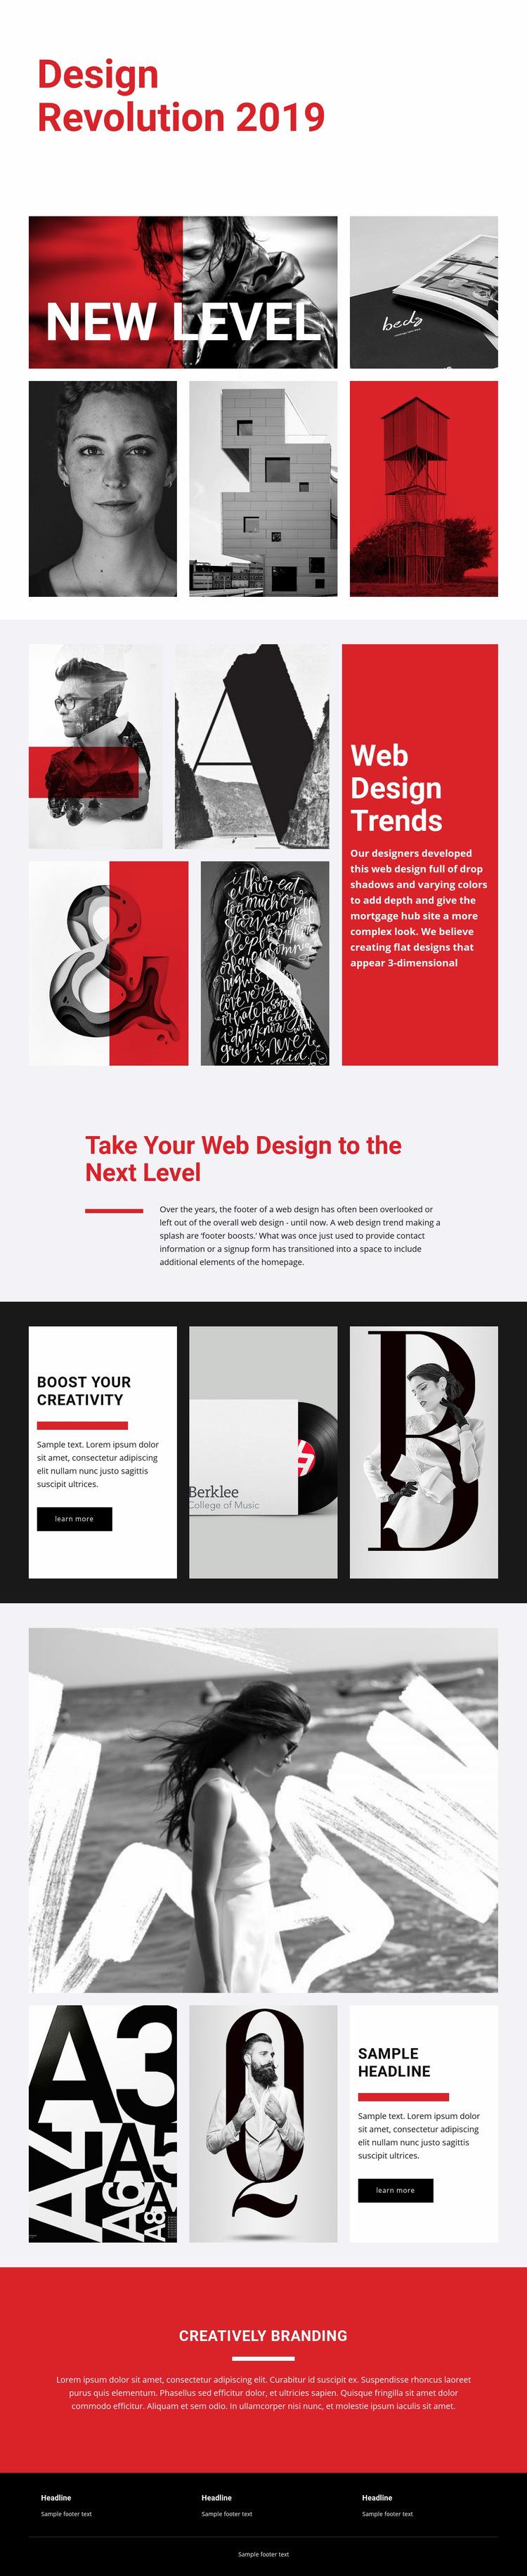 Revolution of designing art Web Page Design